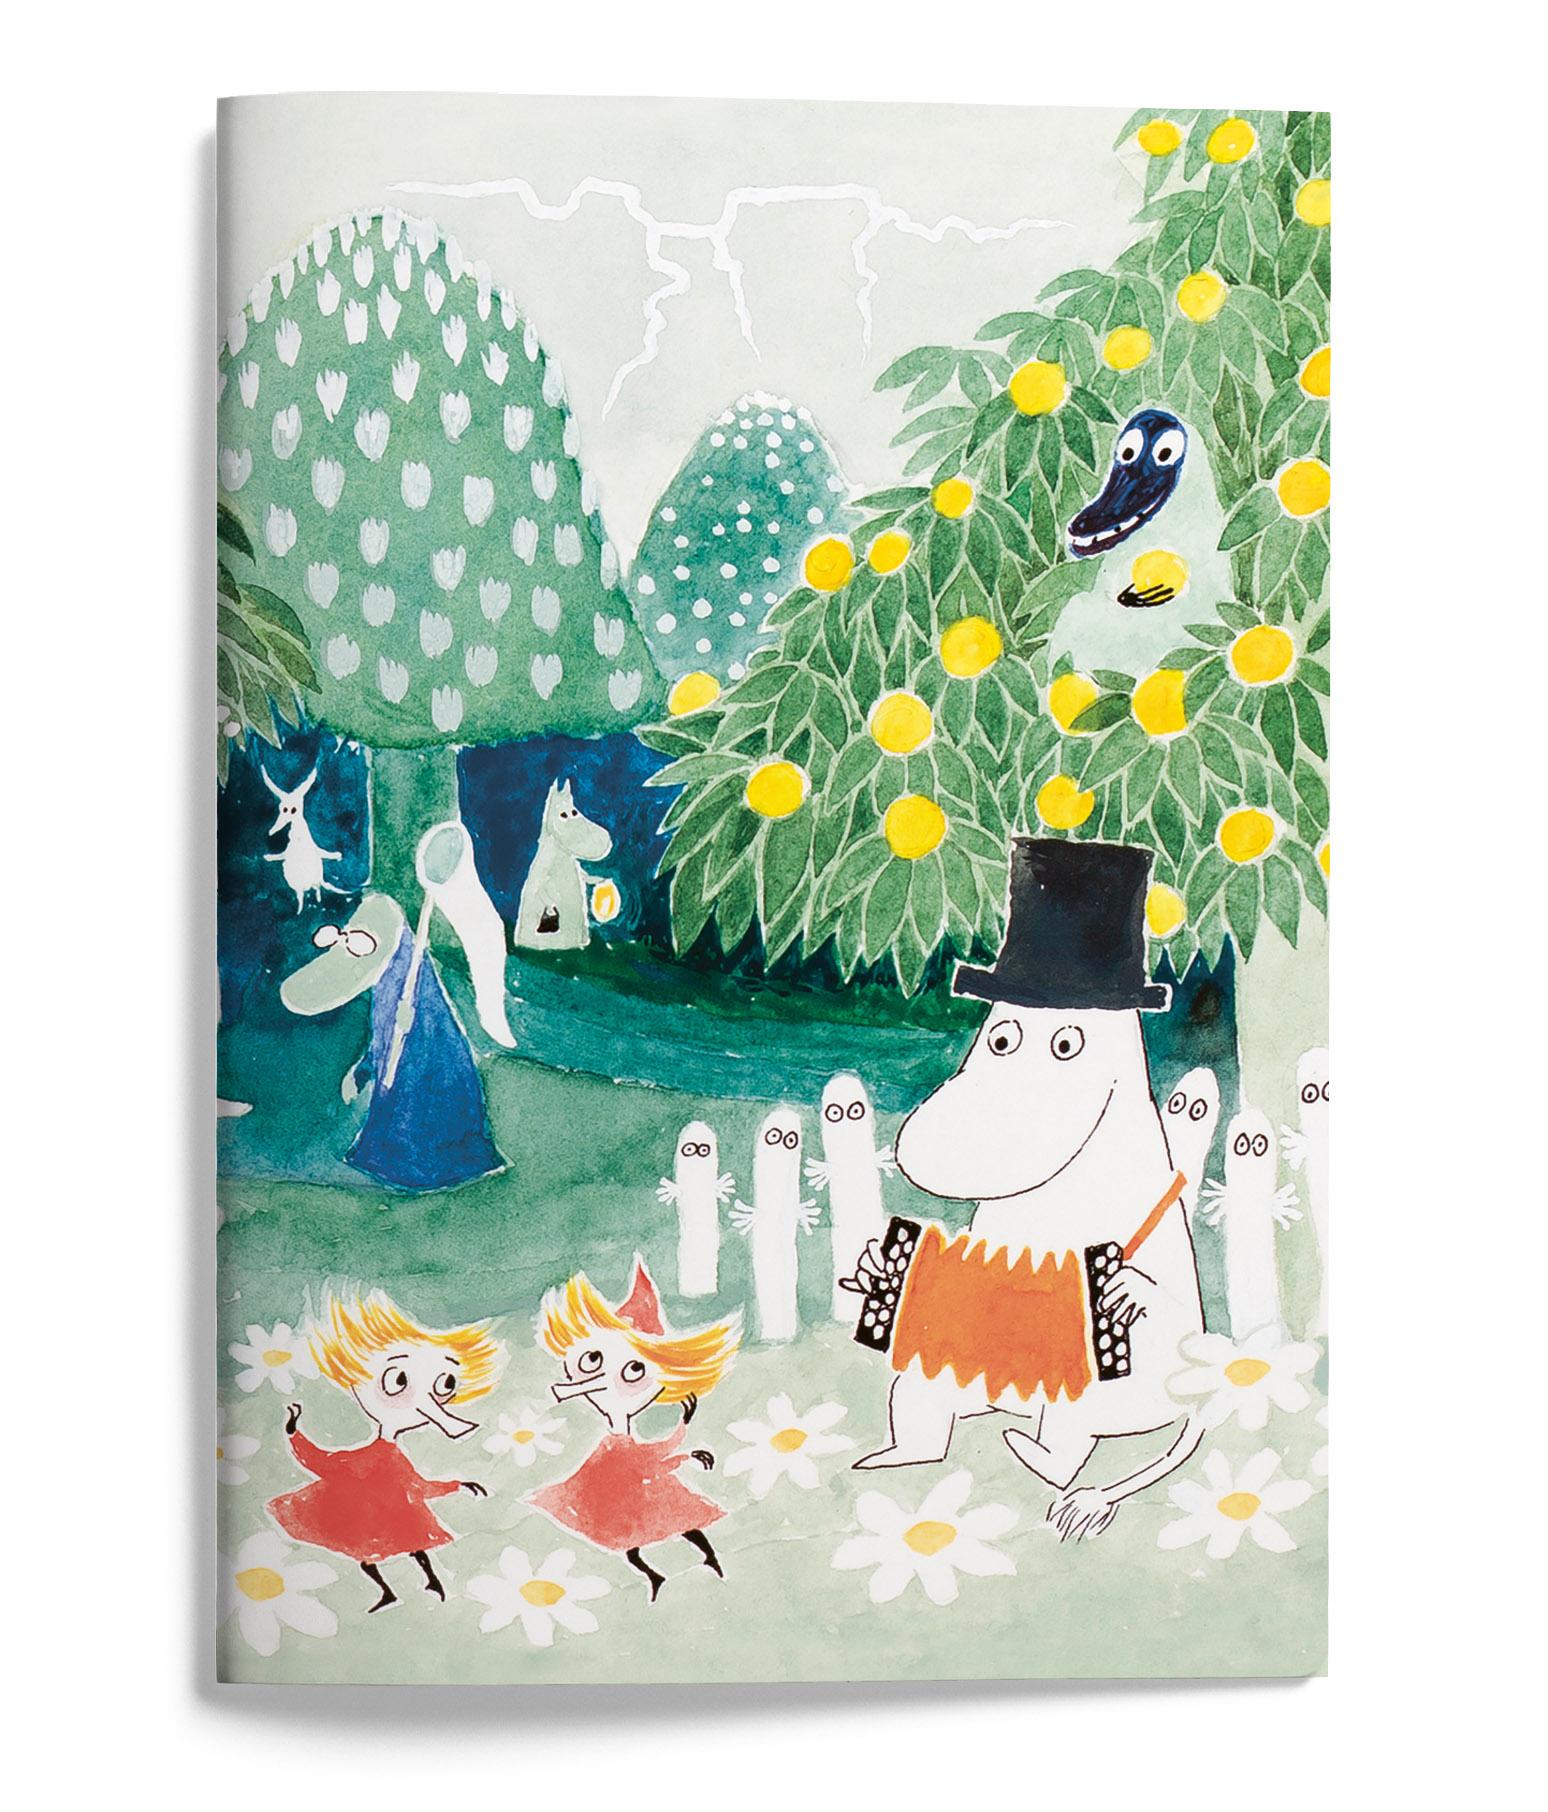 Putinki Softcover Notebook A5 Finn Family Moomintroll